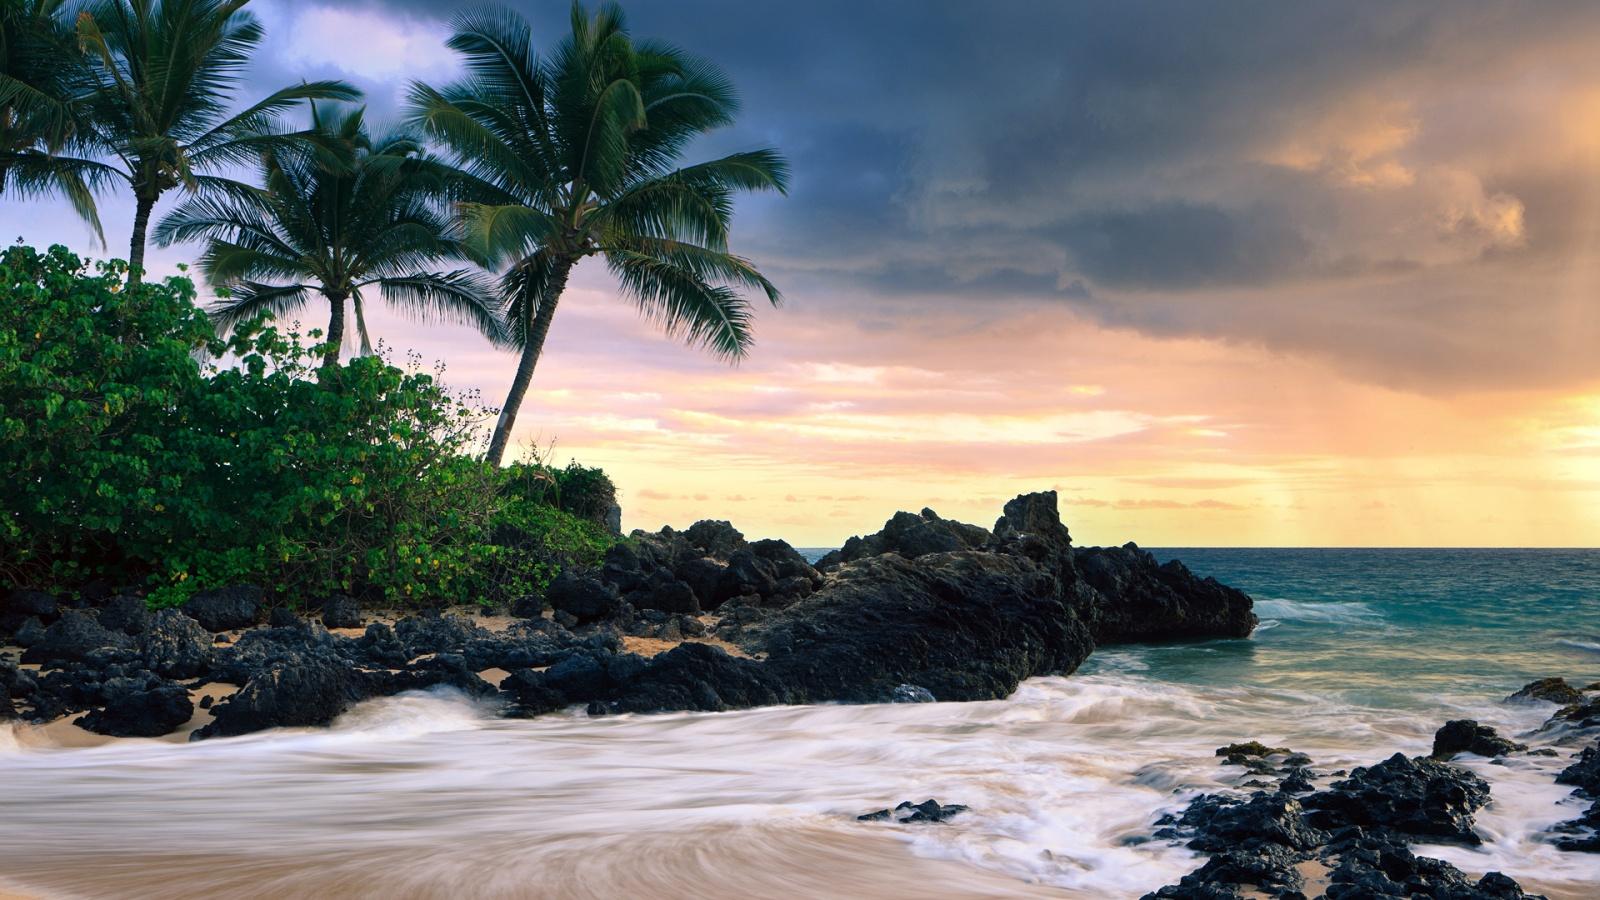 Hawaii Secret Beache Wallpapers HD Wallpapers 1600x900